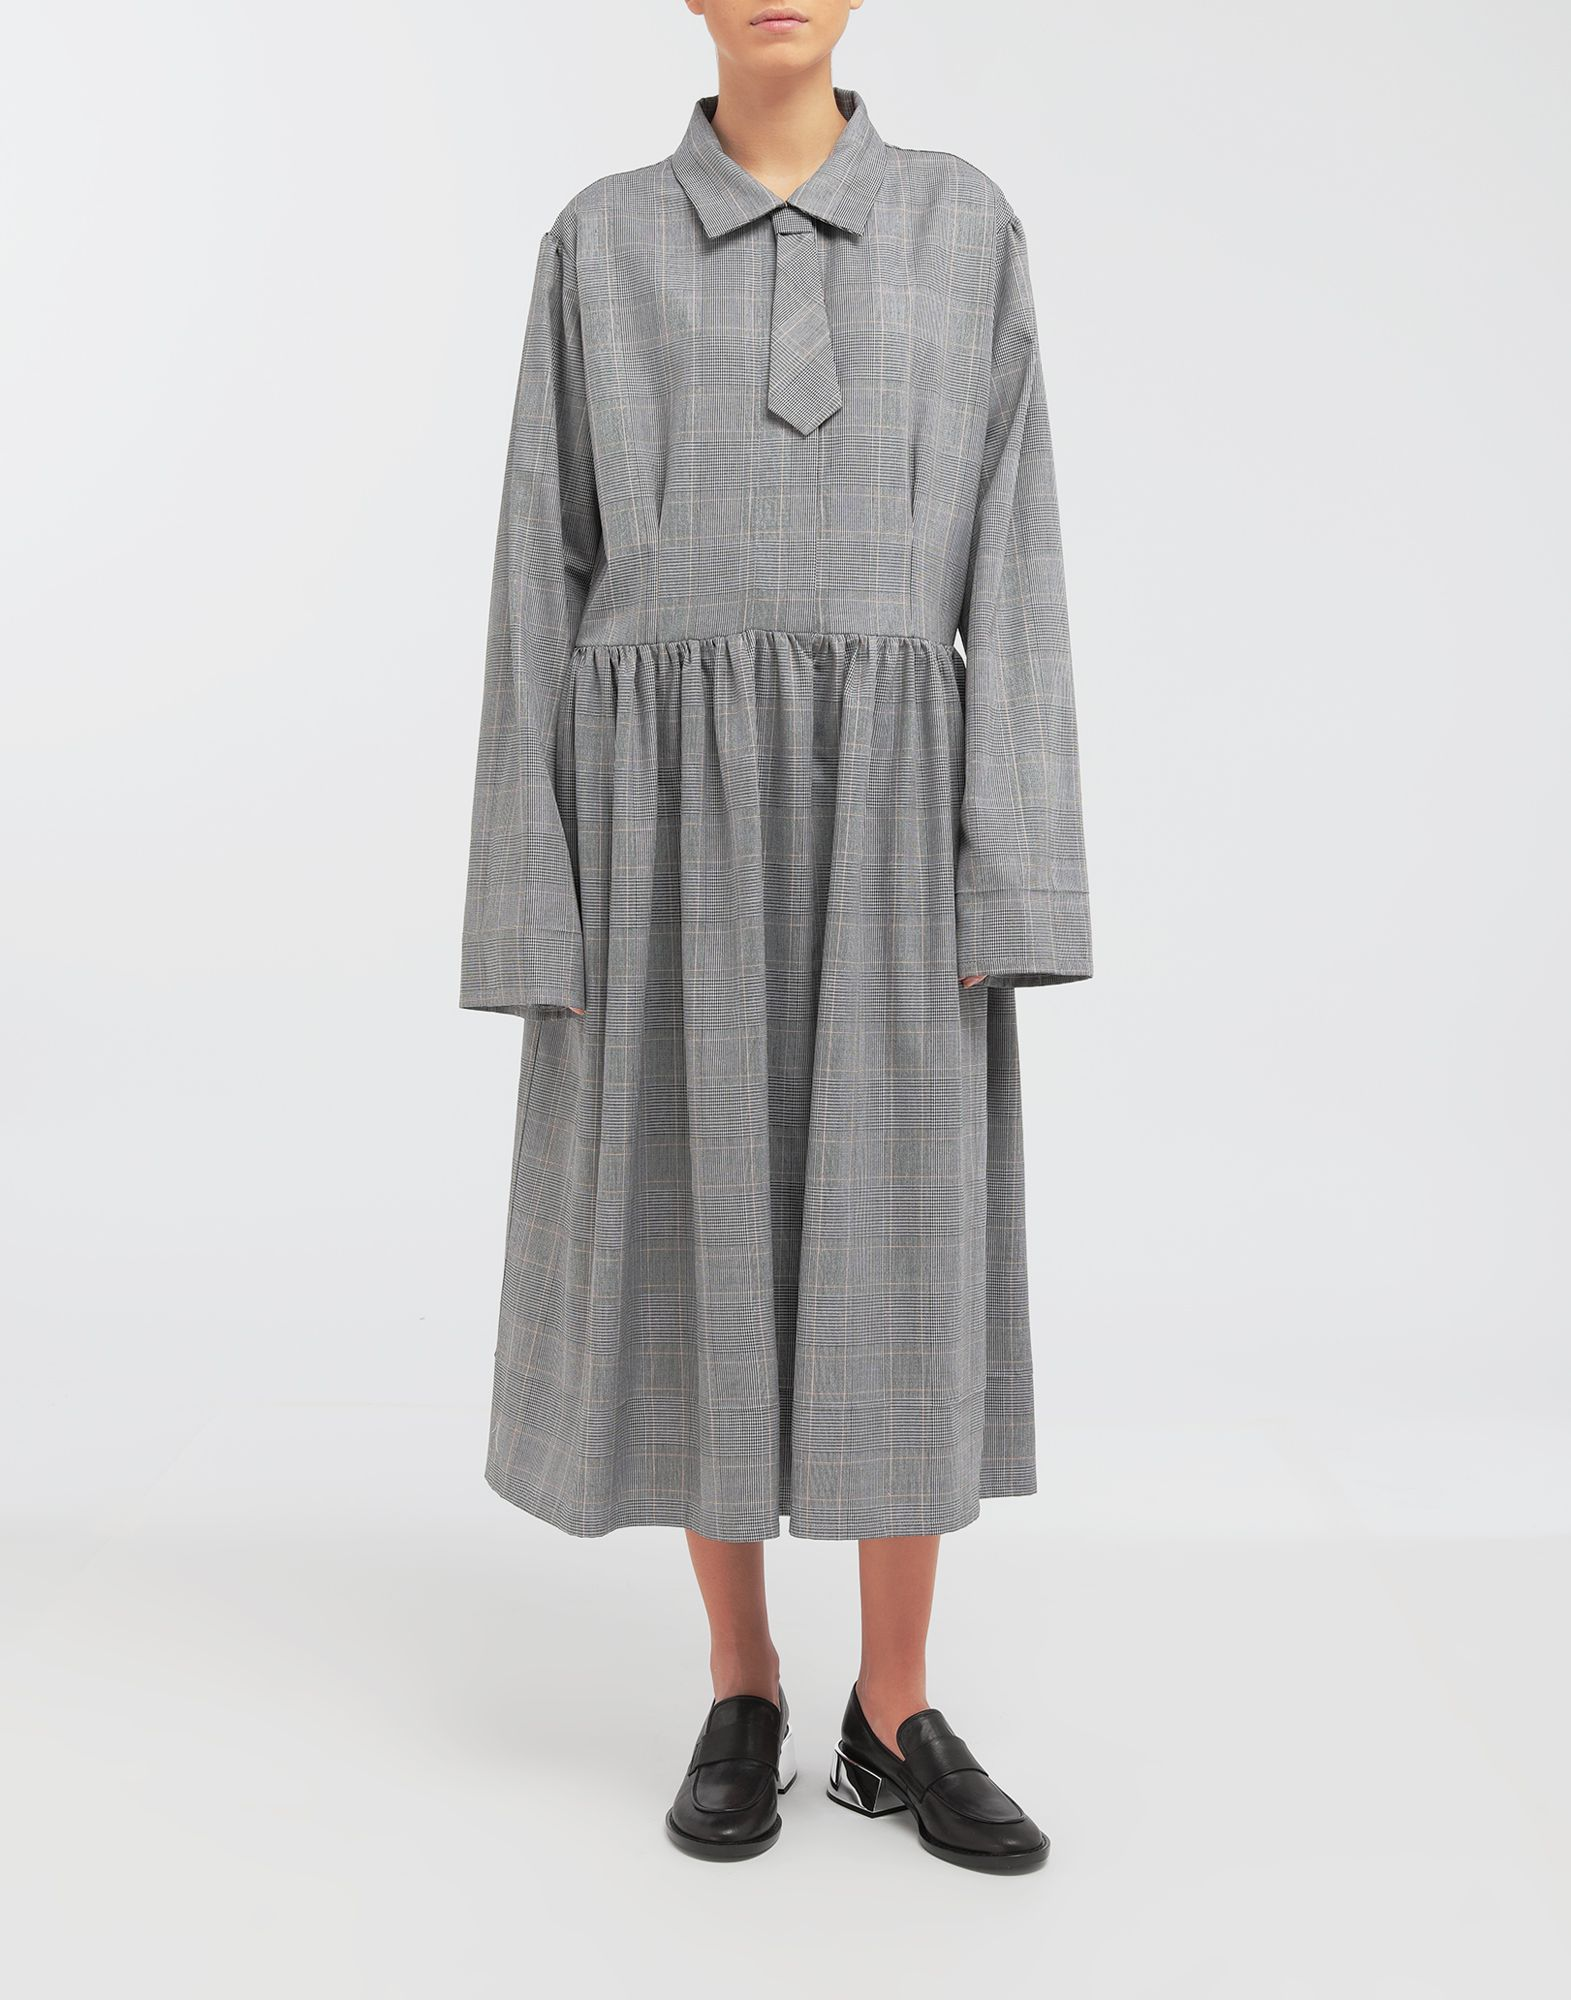 MM6 MAISON MARGIELA Checked necktie maxi dress 3/4 length dress Woman r